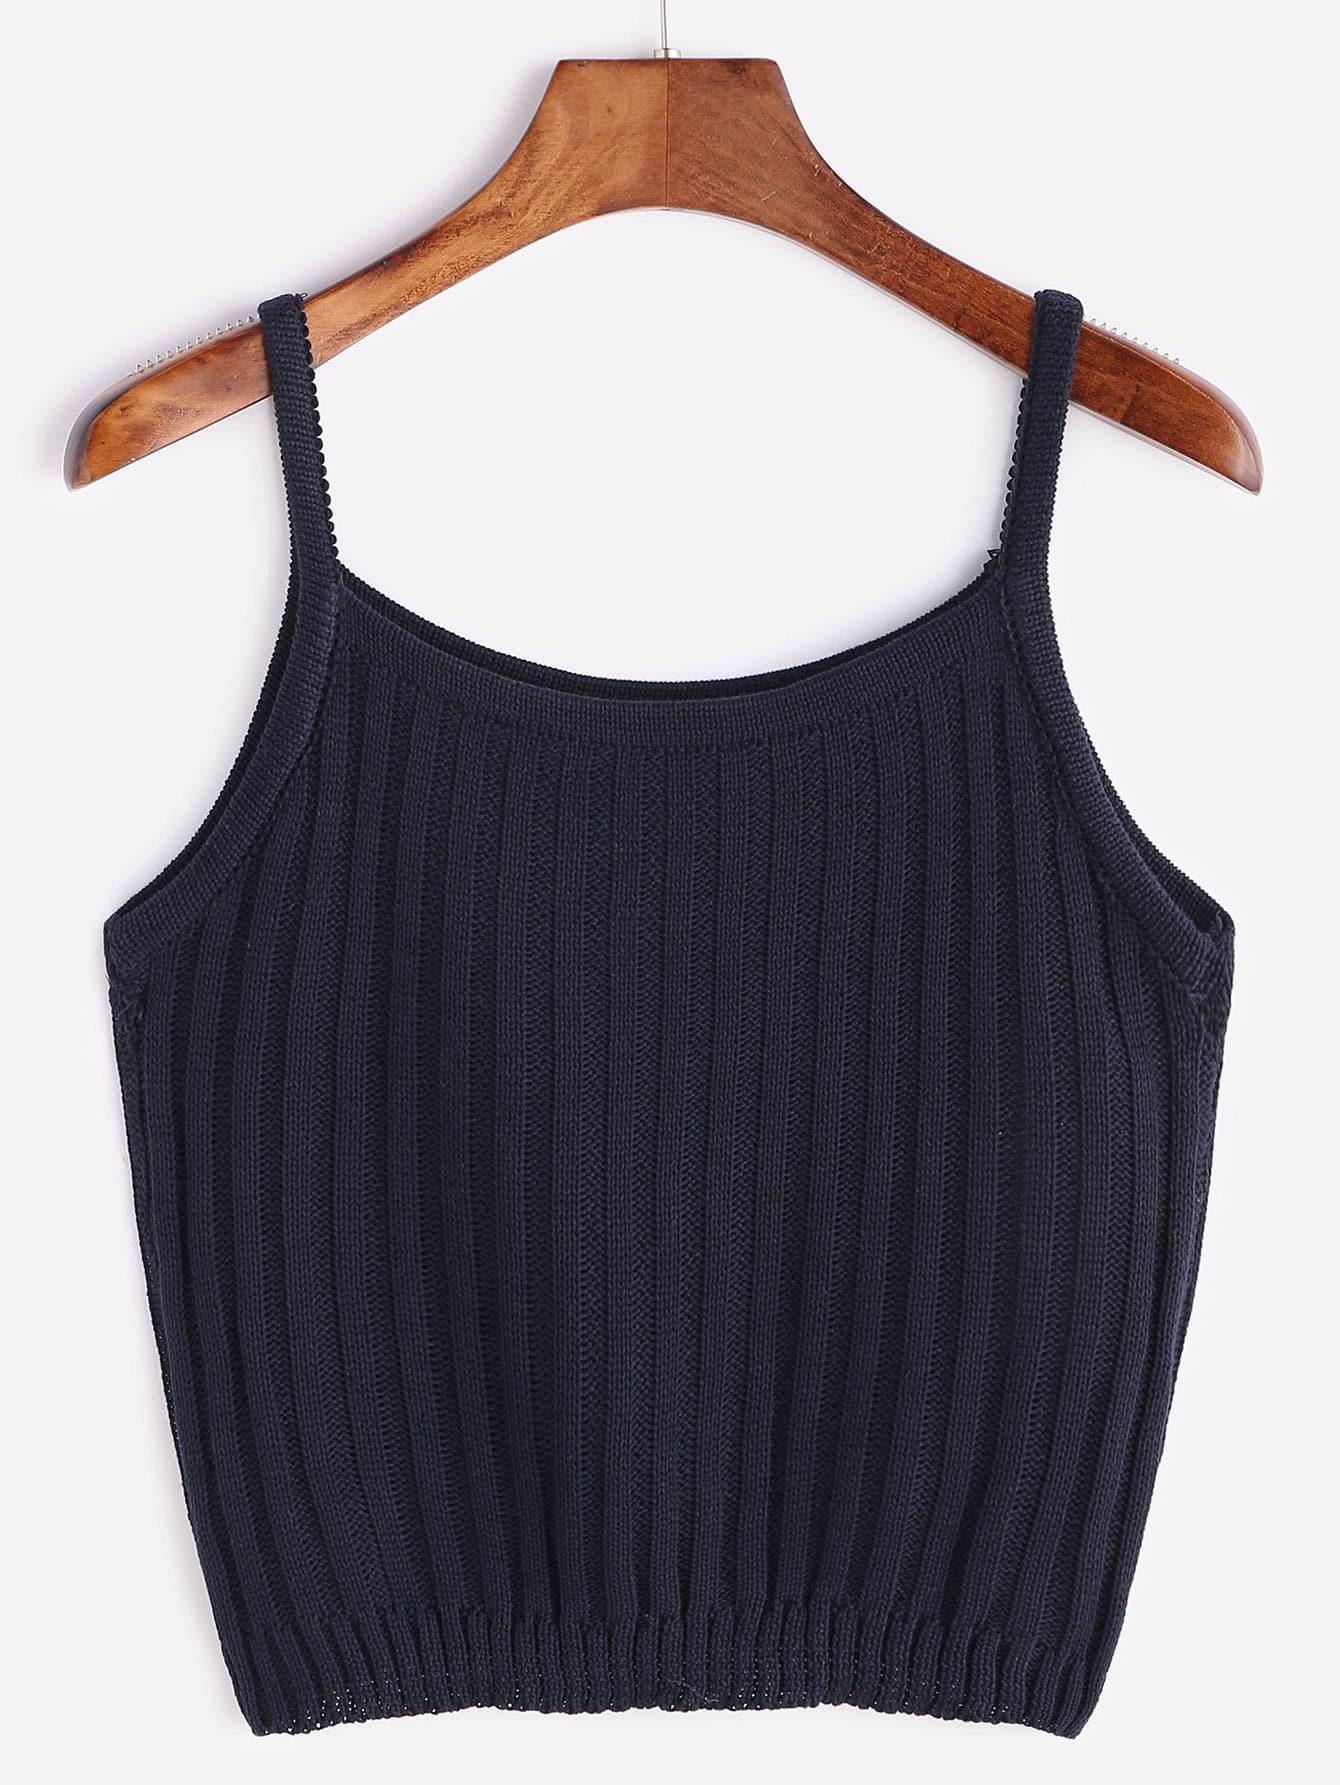 Ribbed Knit Cami Top vest170222456